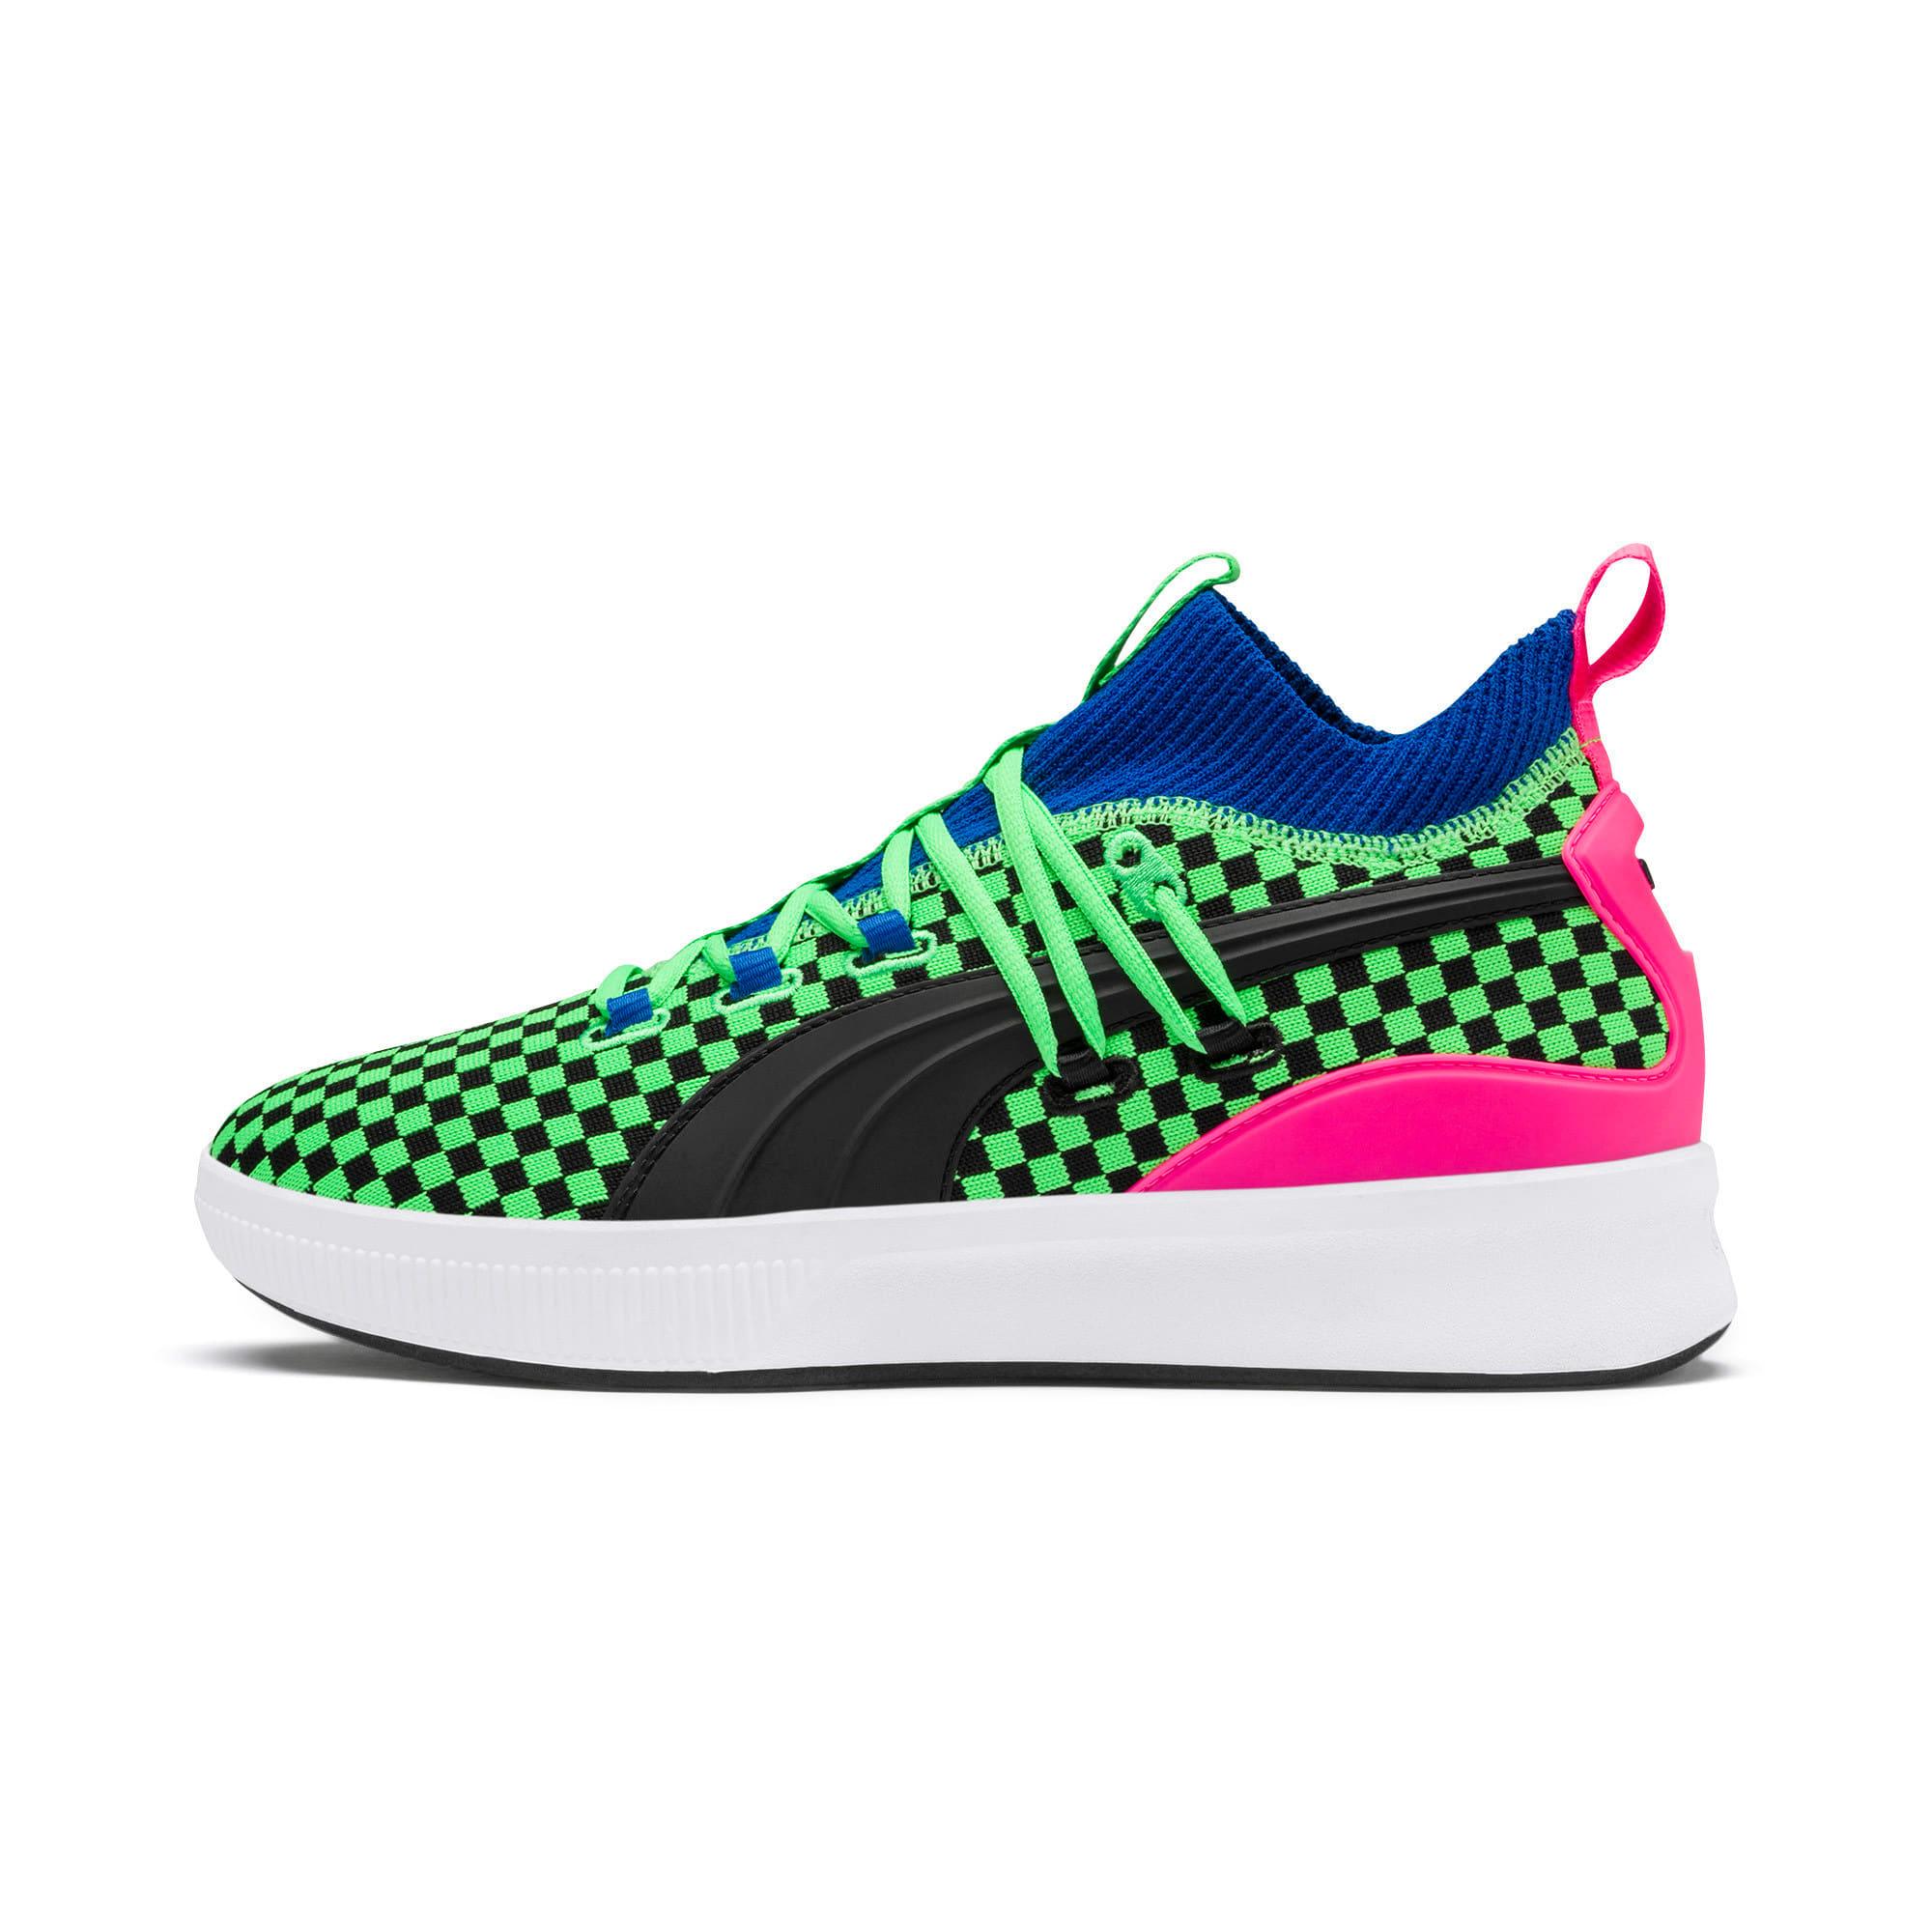 Thumbnail 1 of Clyde Court Summertime Basketball Shoes, 802 C Fluro Green PES, medium